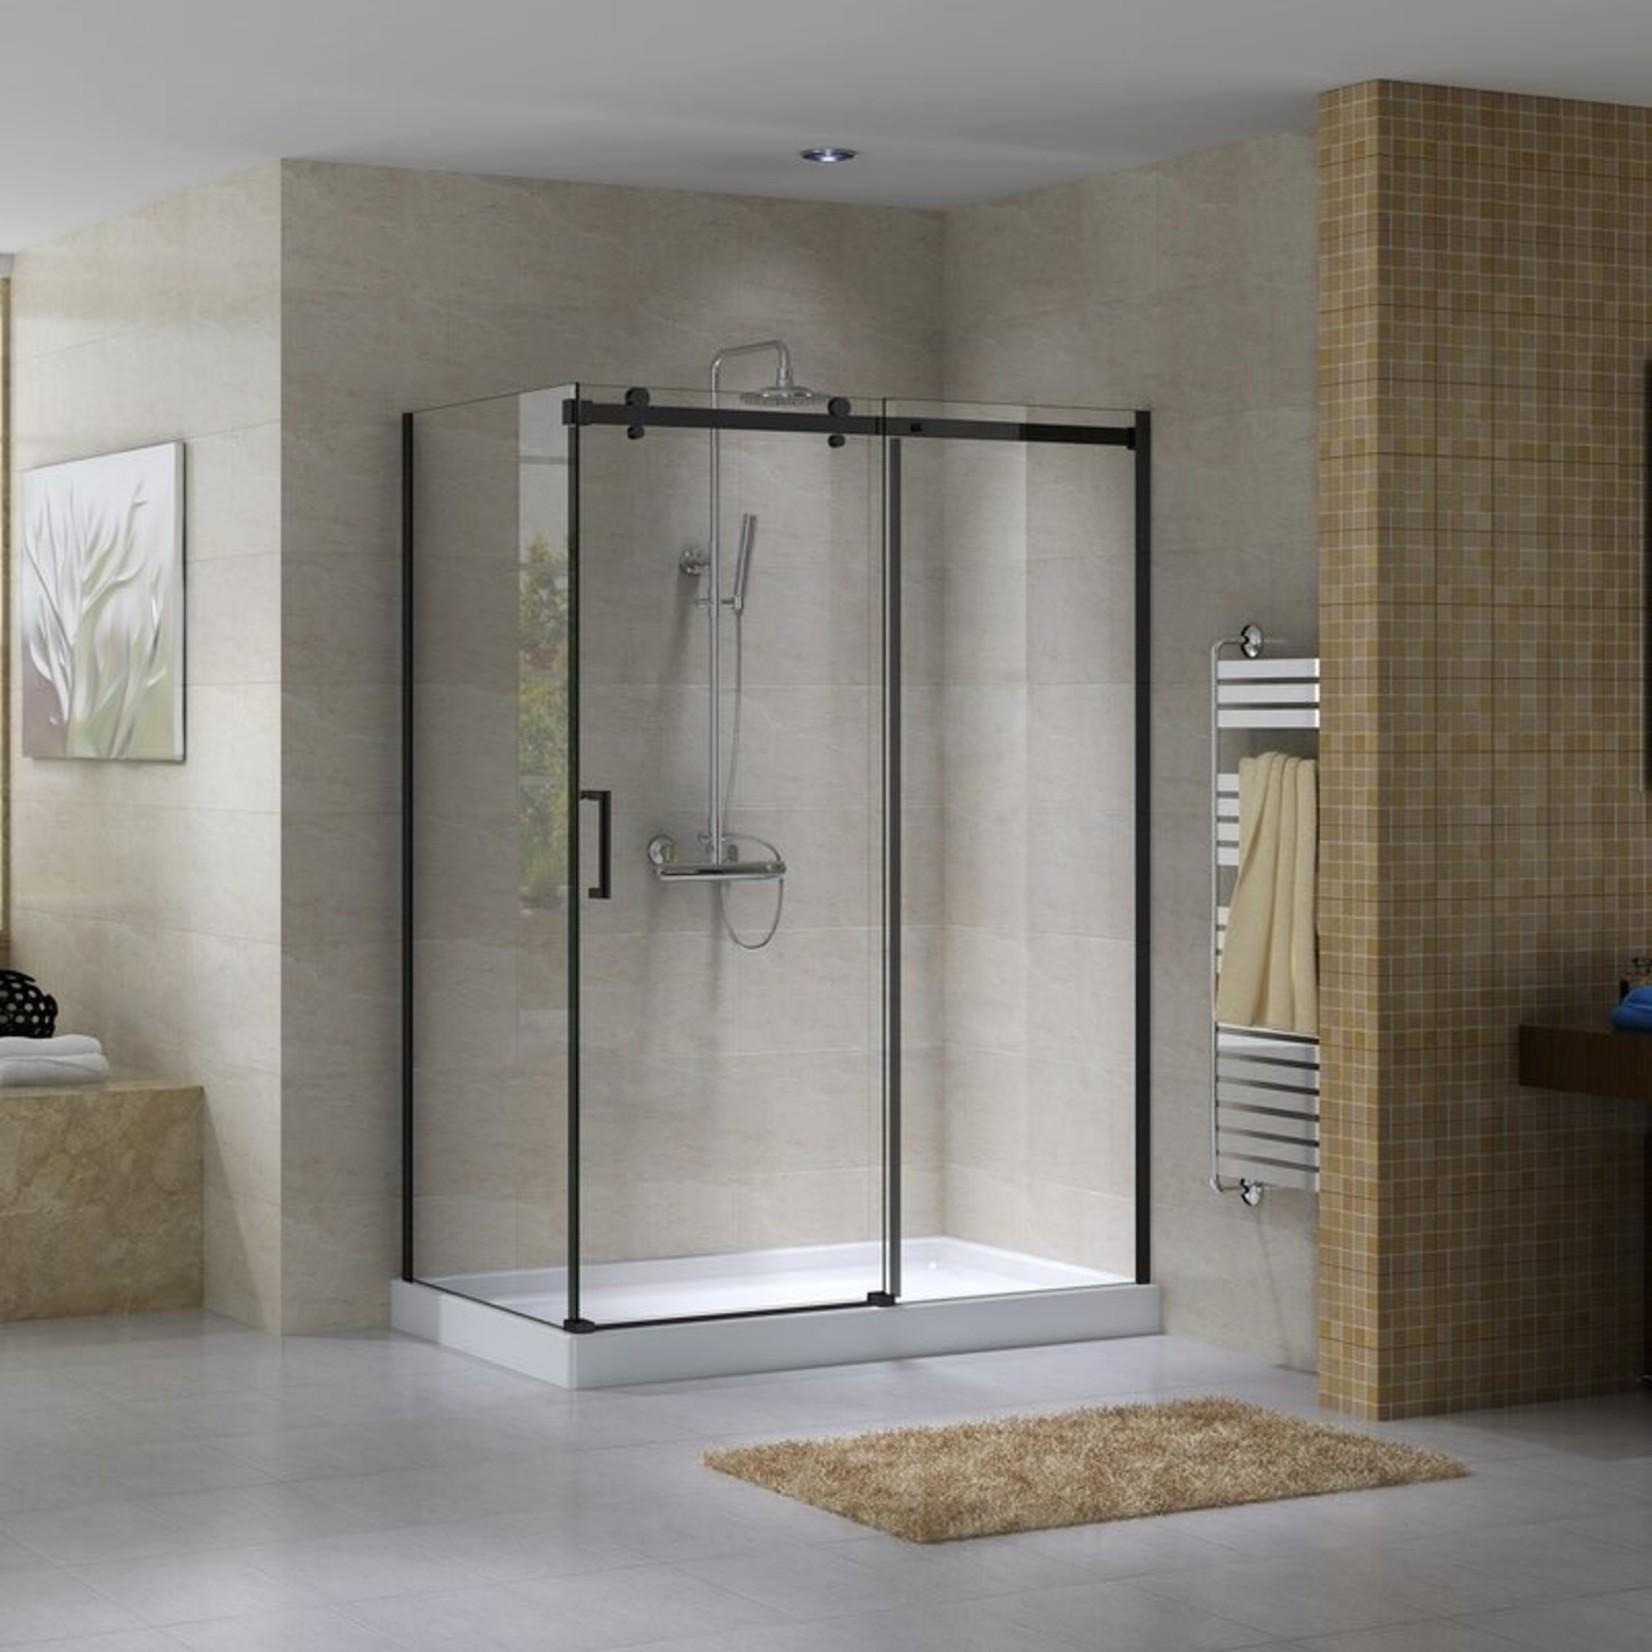 Reversible shower set 32x48 black Quartz Jade series